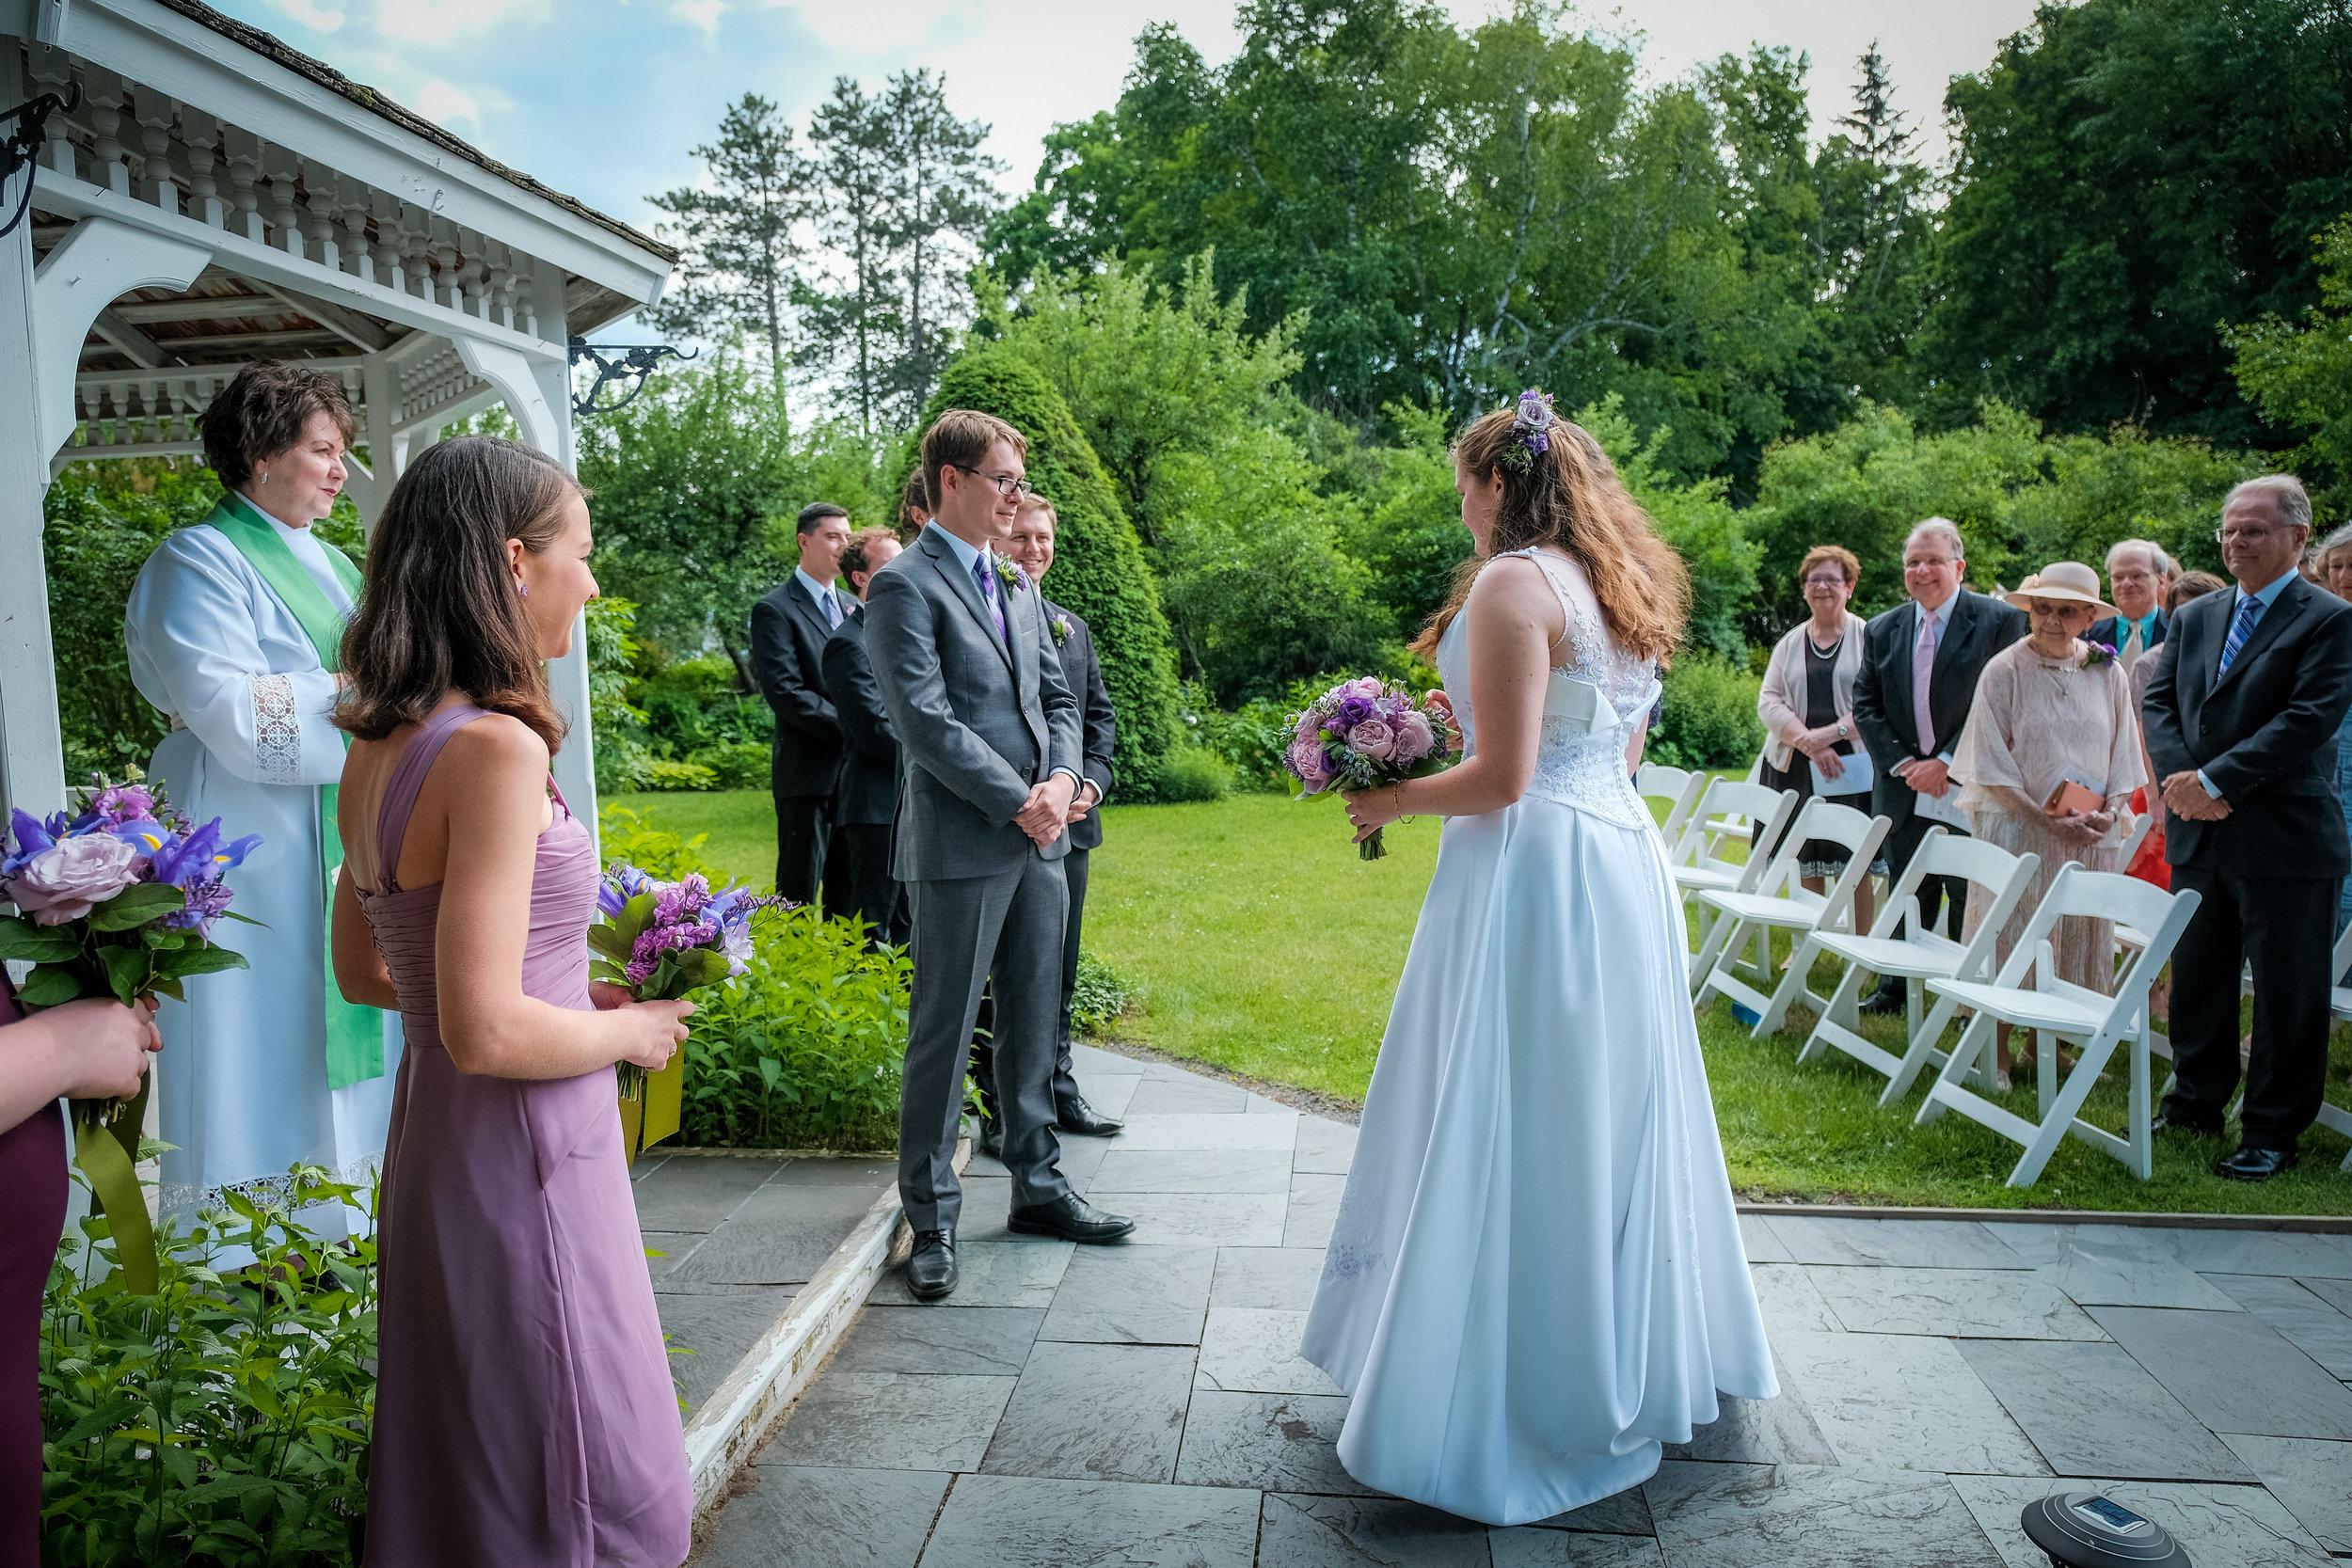 Vermont-Lilac-Inn-Wedding-Photography-547.jpg